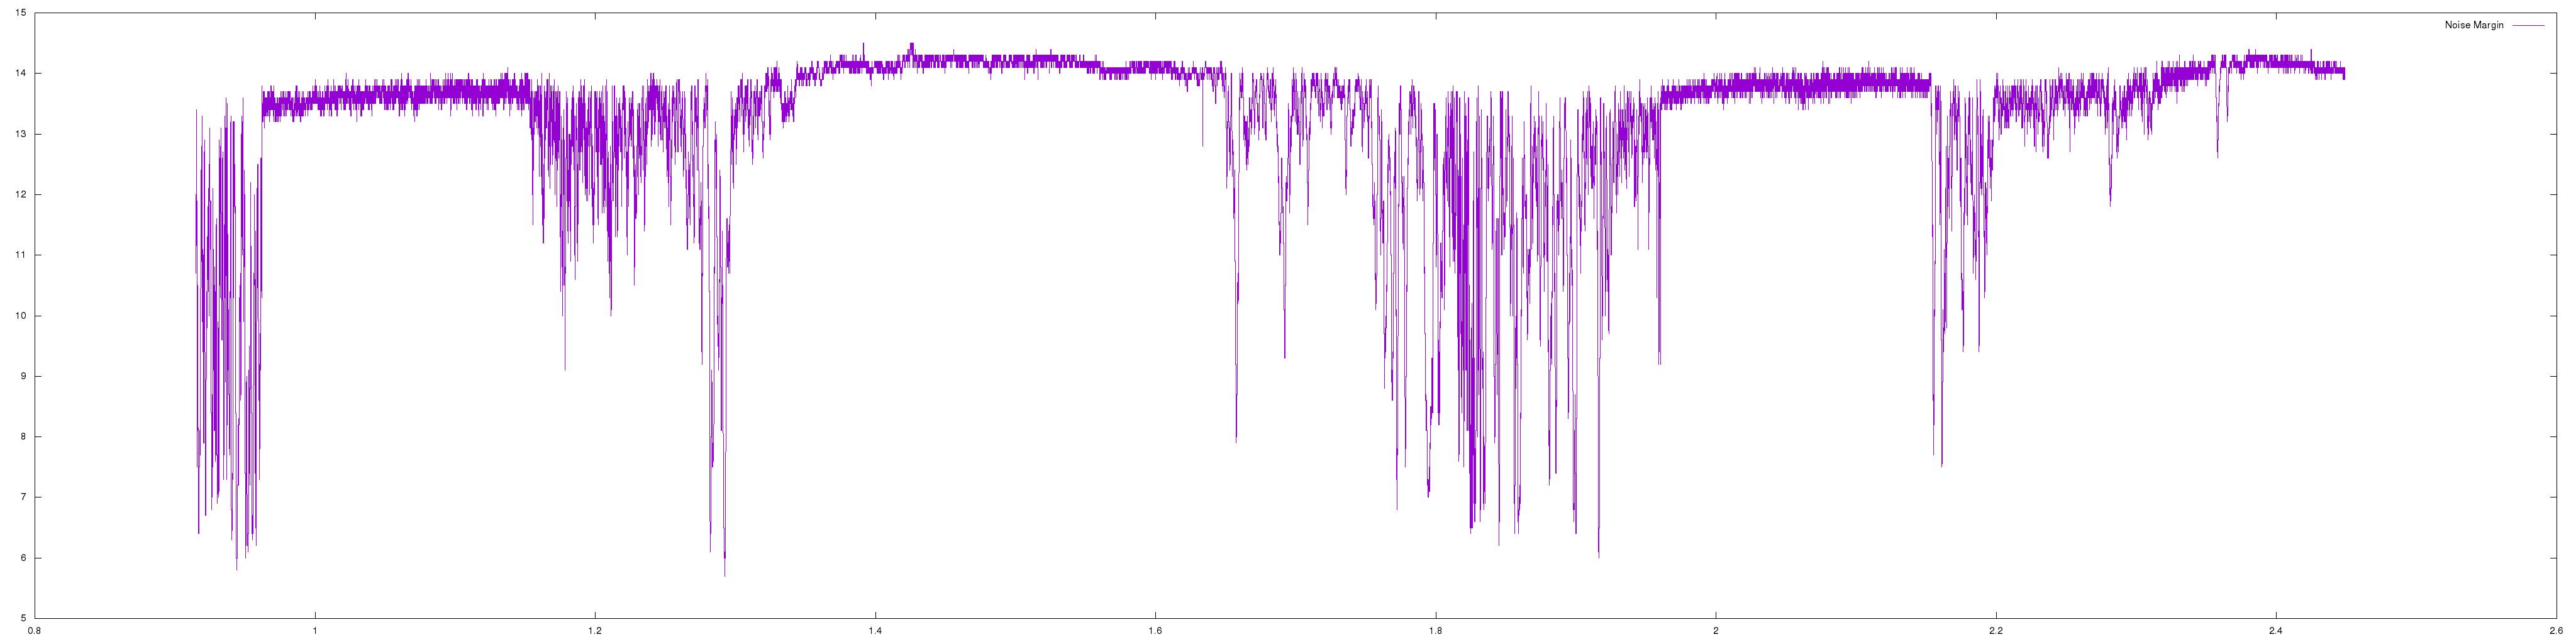 Downstream SNR varying wildly - Plusnet Community